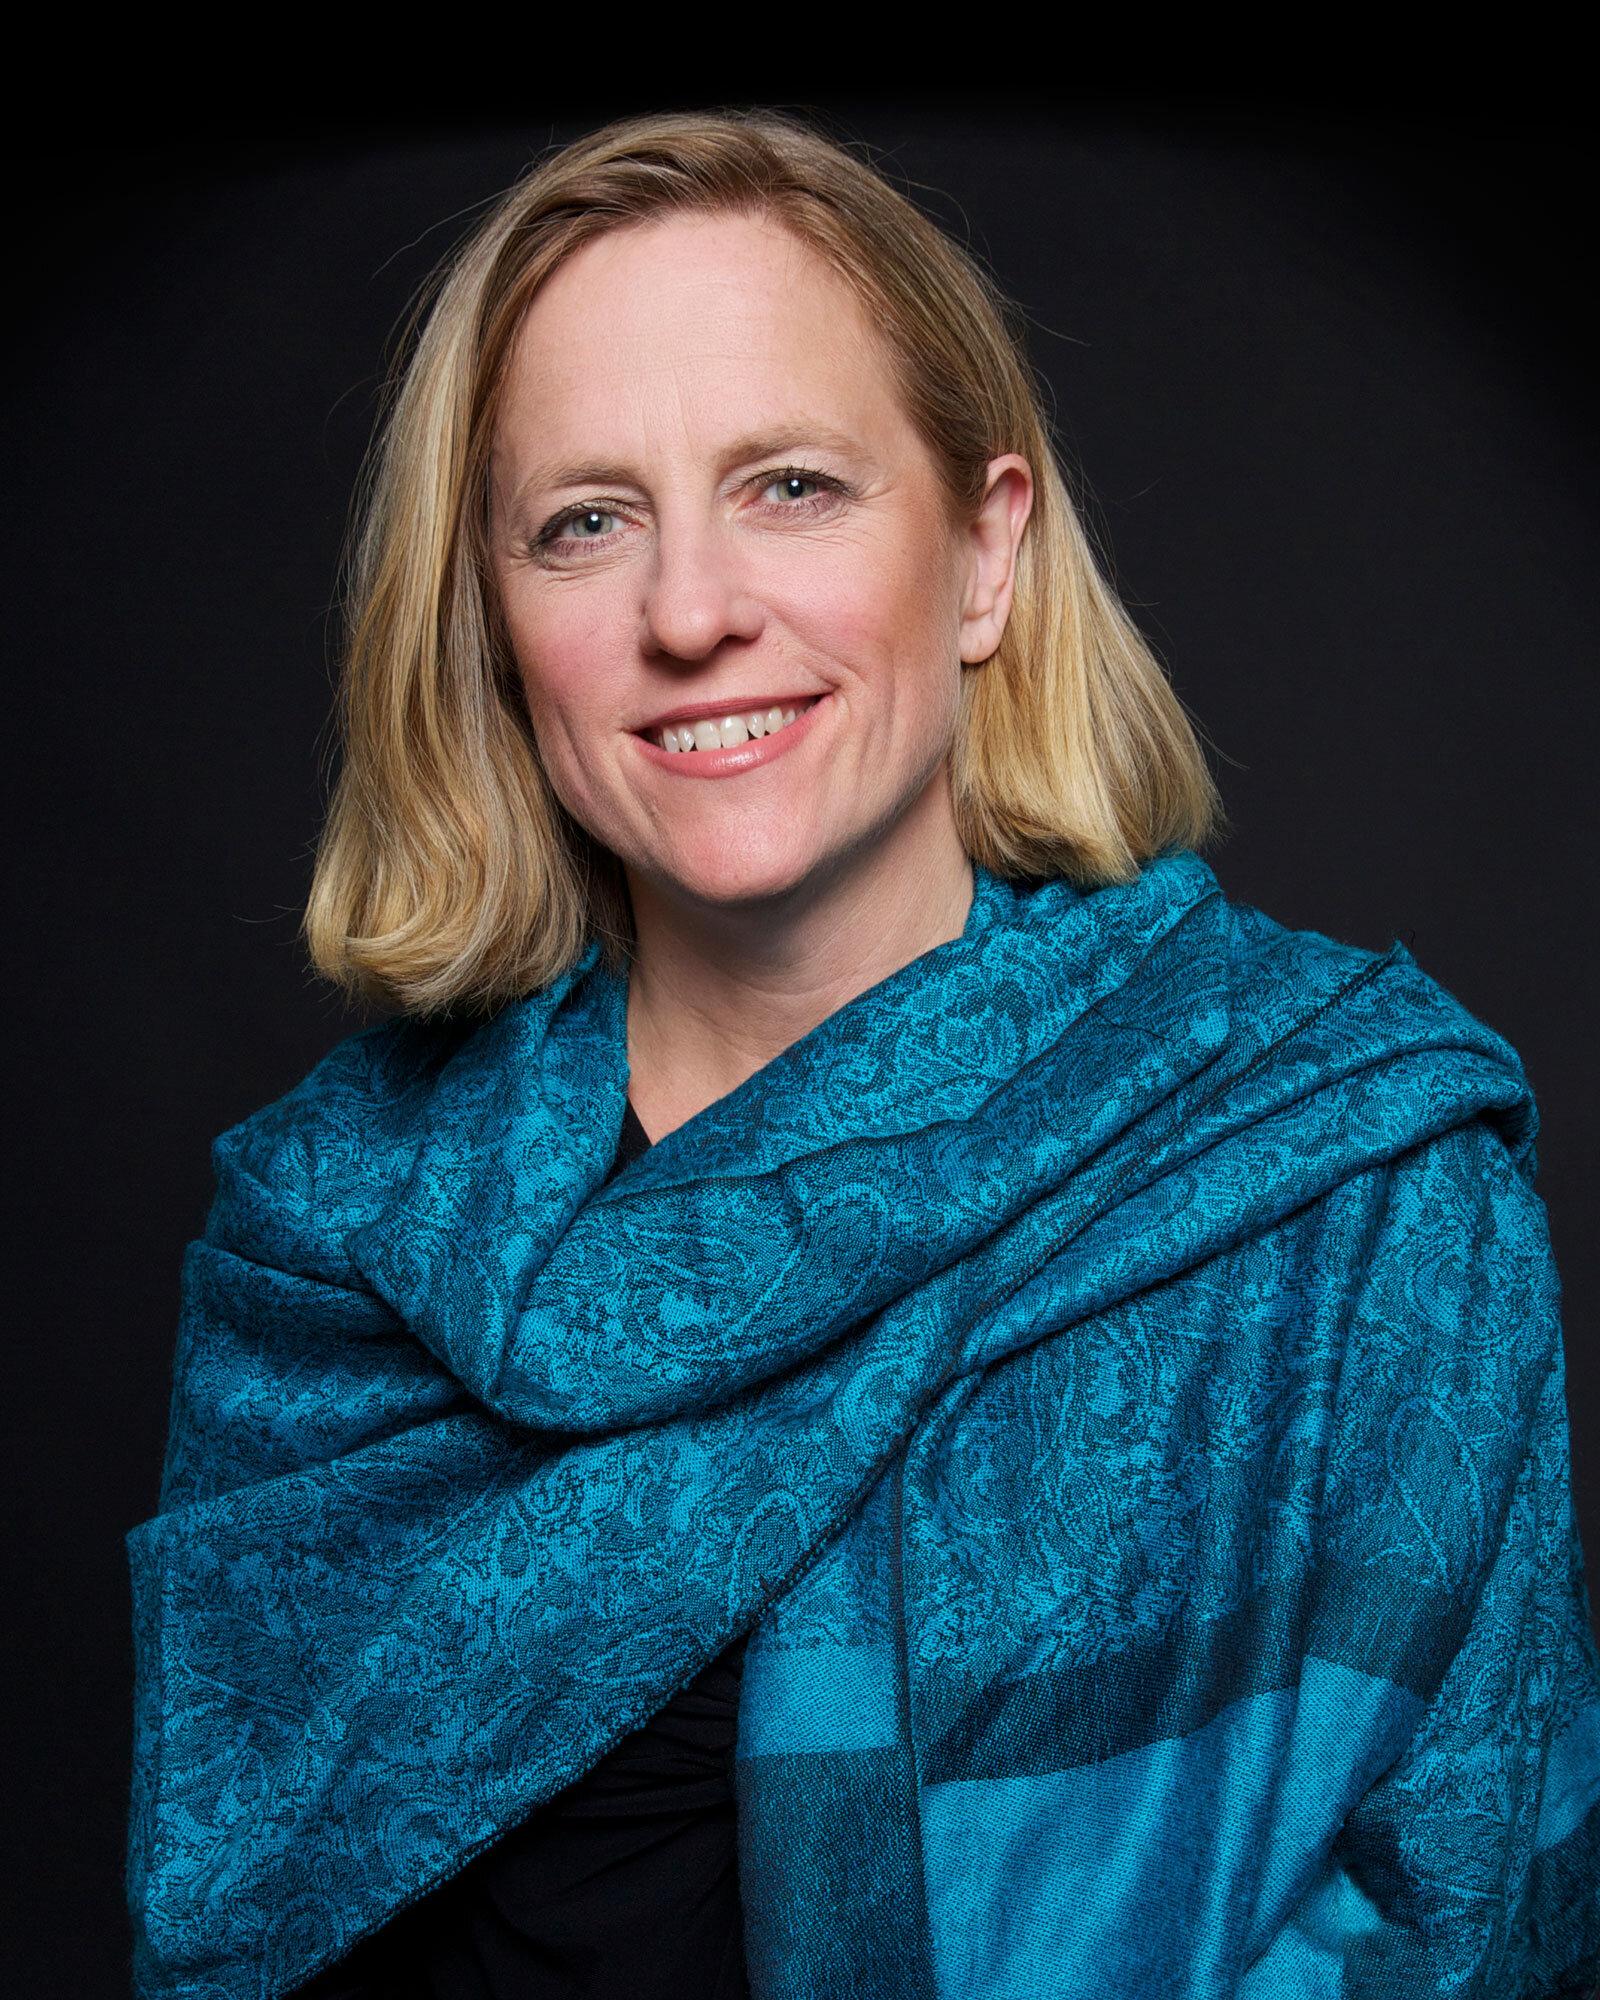 Borough President Melinda Katz is the Democratic nominee for Queens district attorney. Photo courtesy of Katz's campaign.